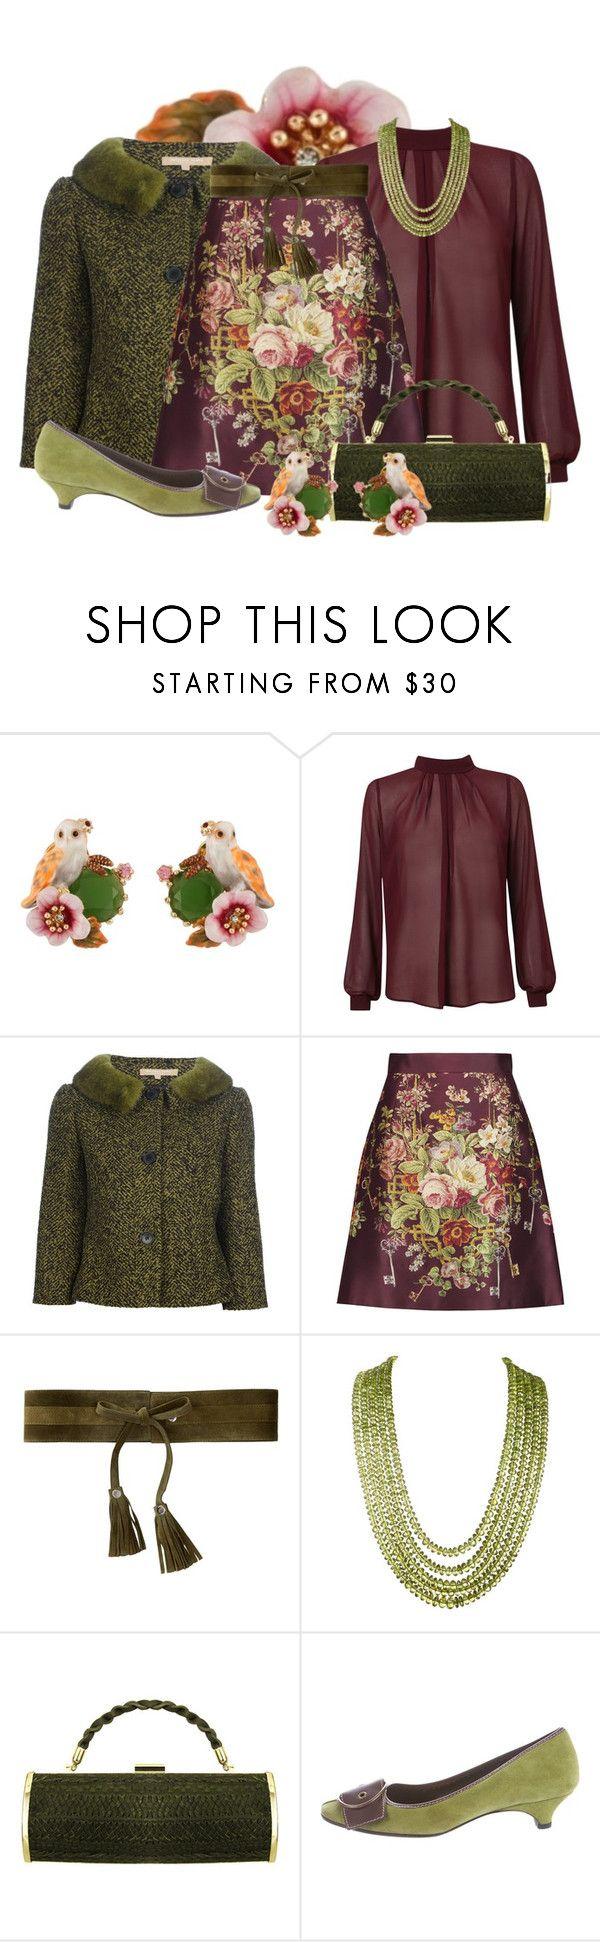 """Dolce & Gabbana Printed silk and wool-blend satin mini skirt"" by twinkle-misfit ❤ liked on Polyvore featuring Les Néréides, Michael Kors, Dolce&Gabbana, J.J. Winters, KOVA and Miu Miu"